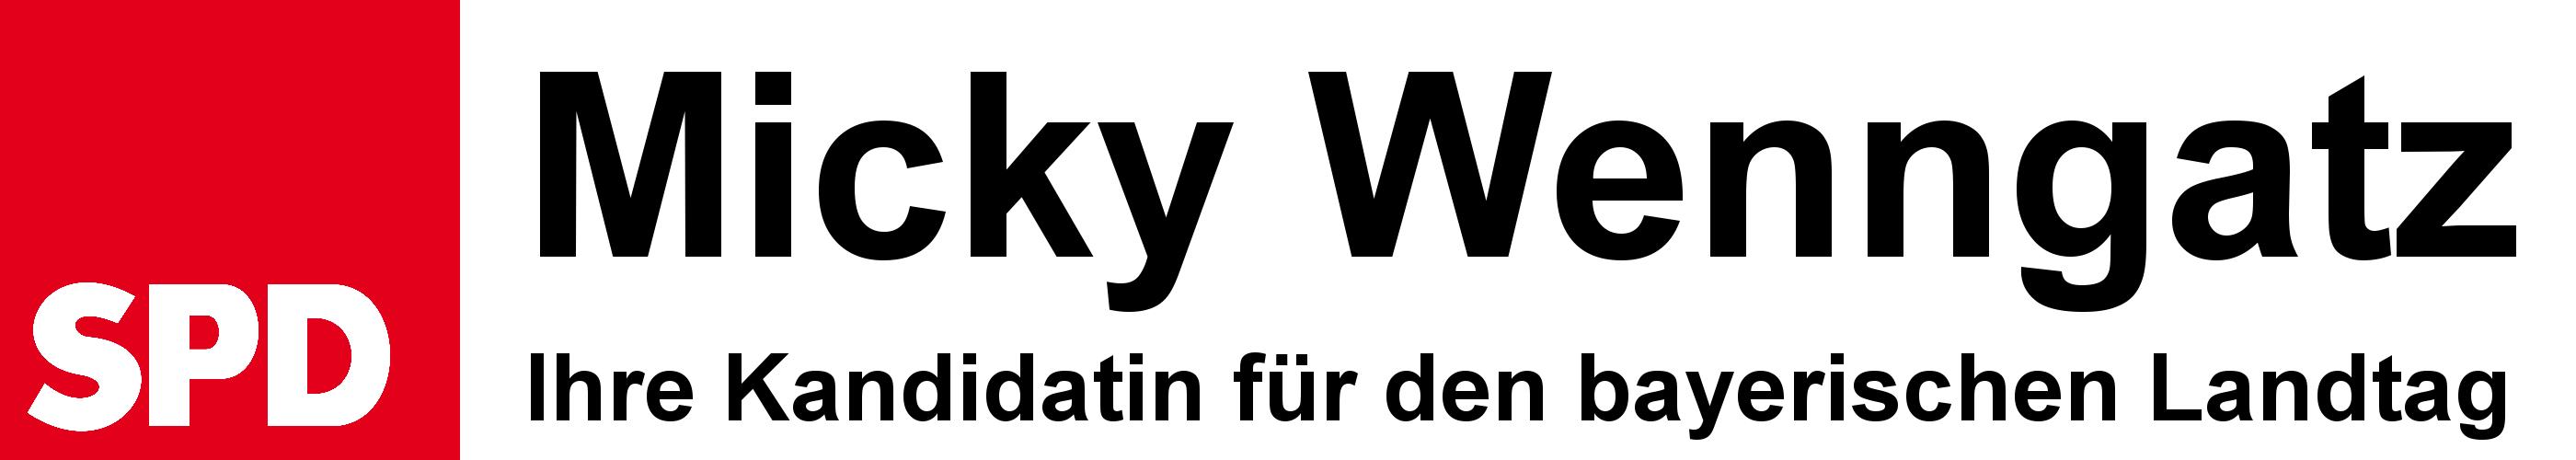 Micky Wenngatz